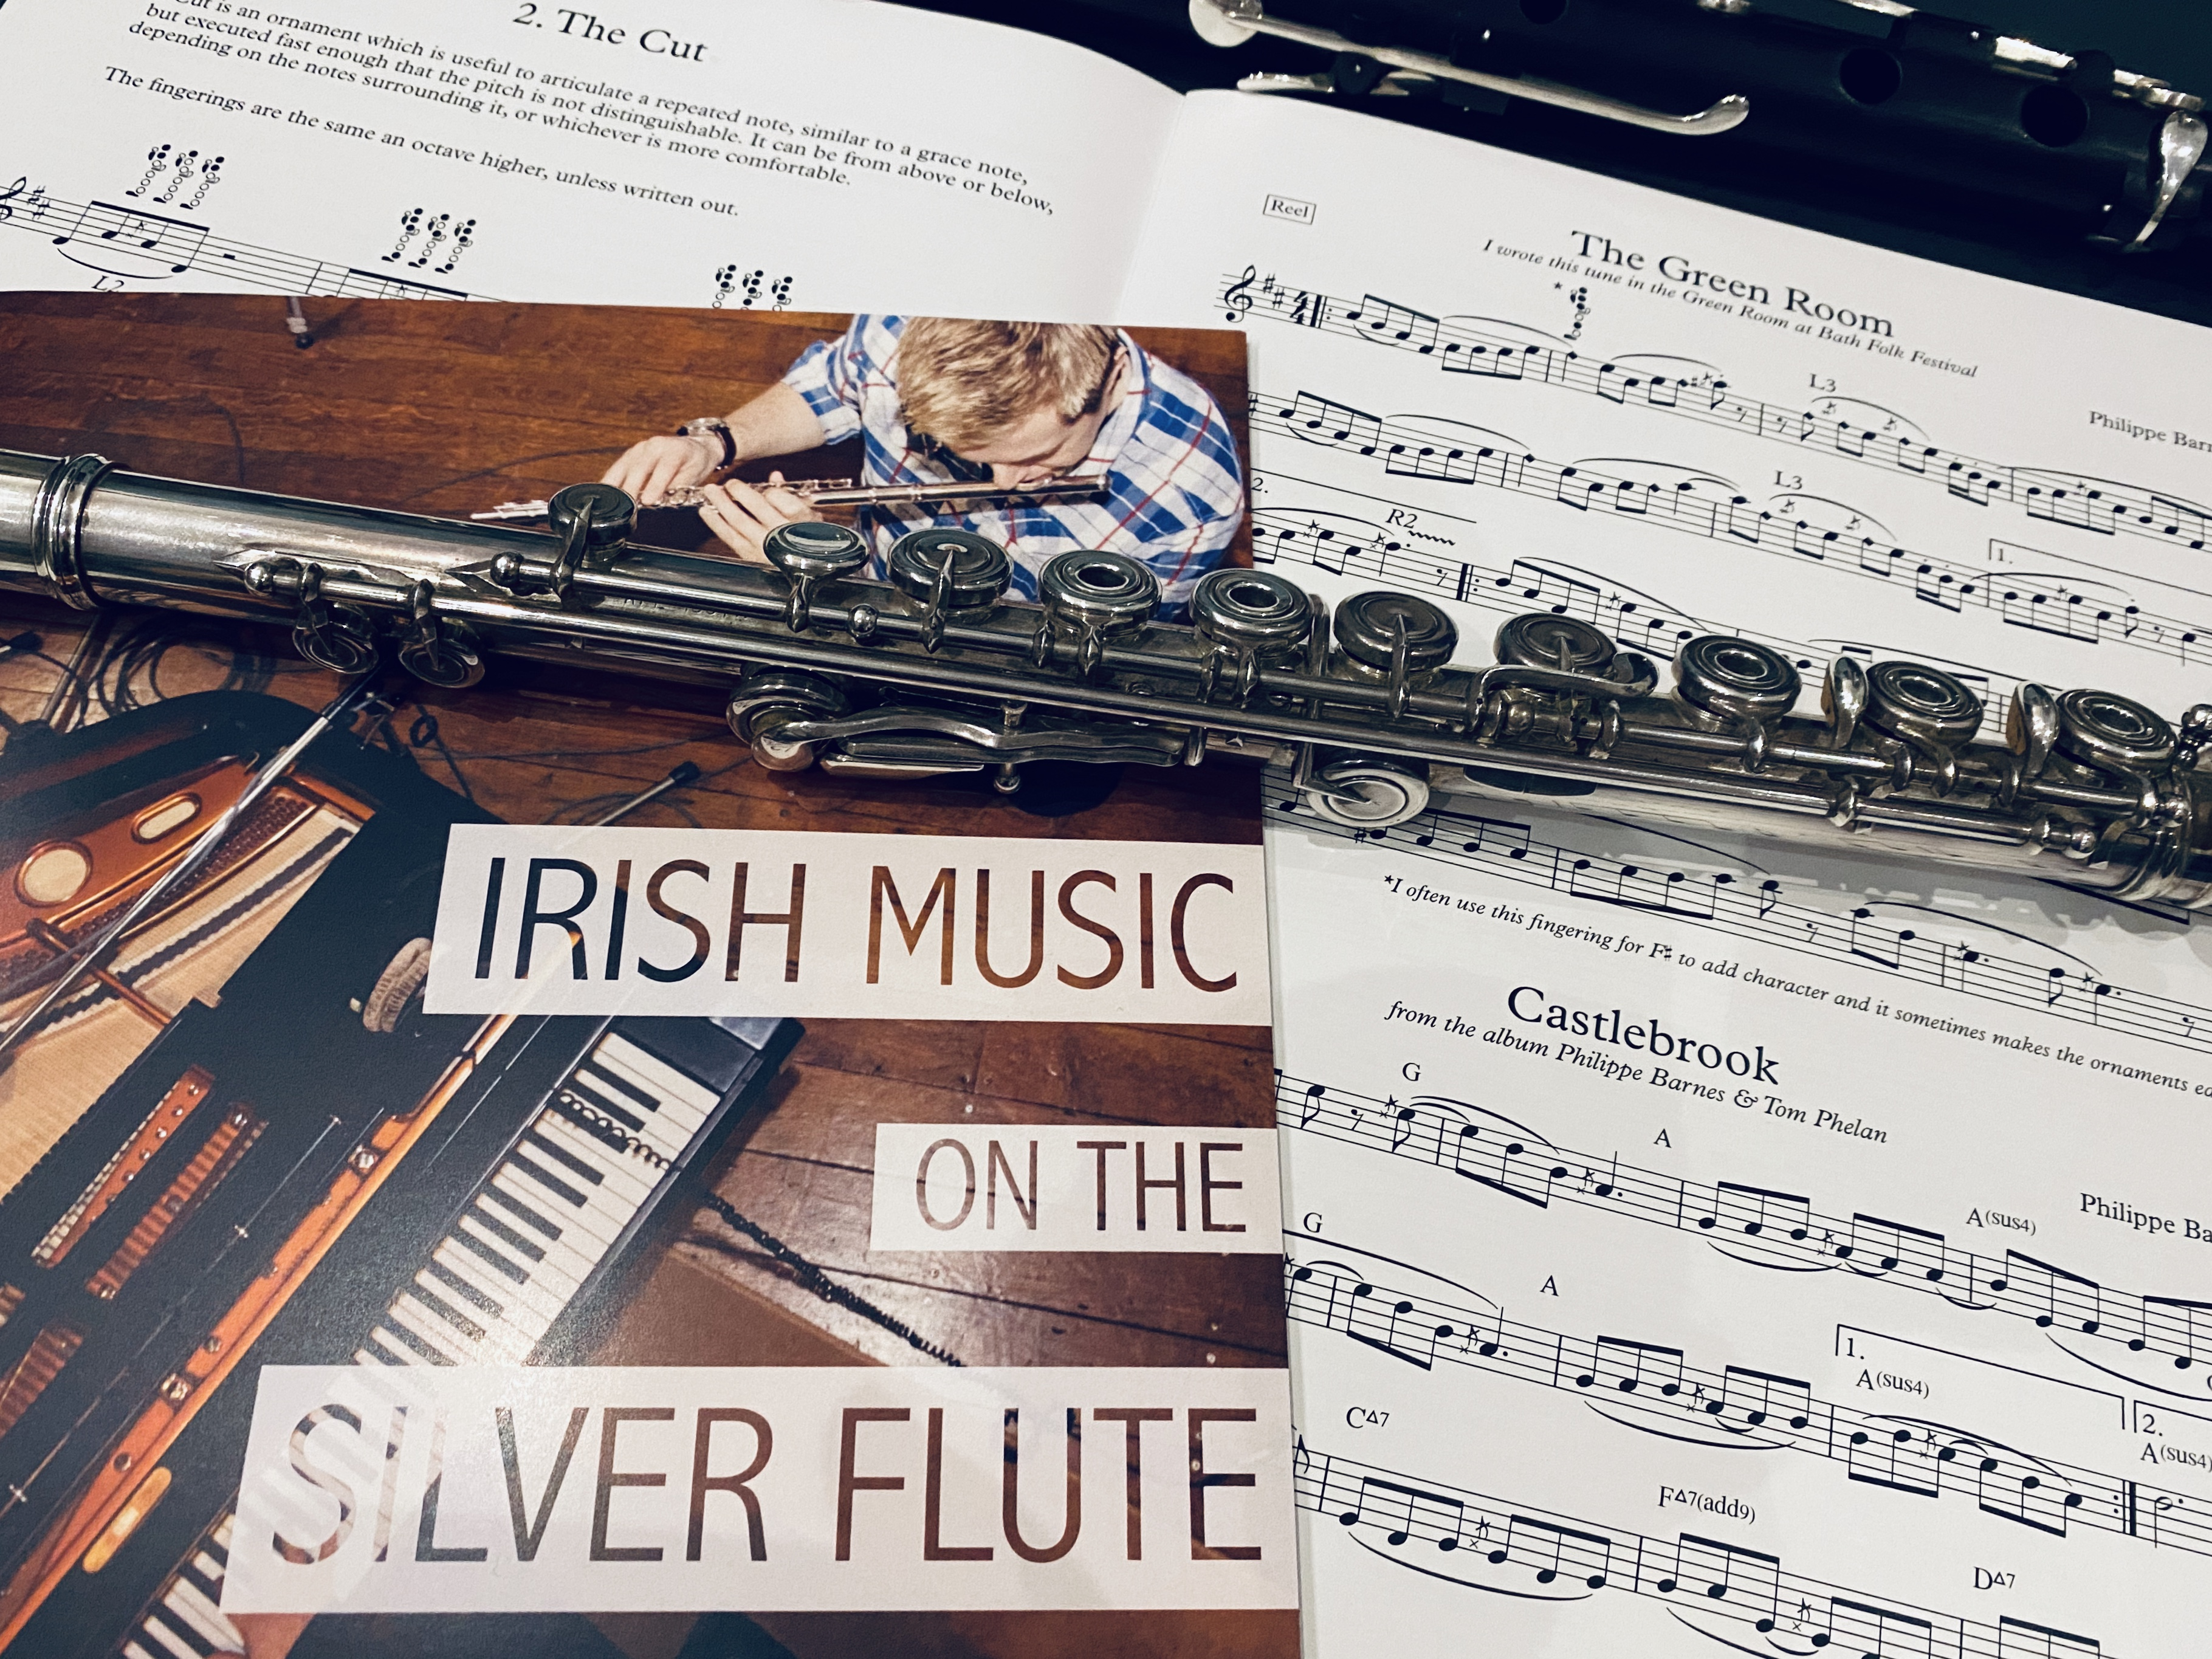 Irish Music Silver Flute